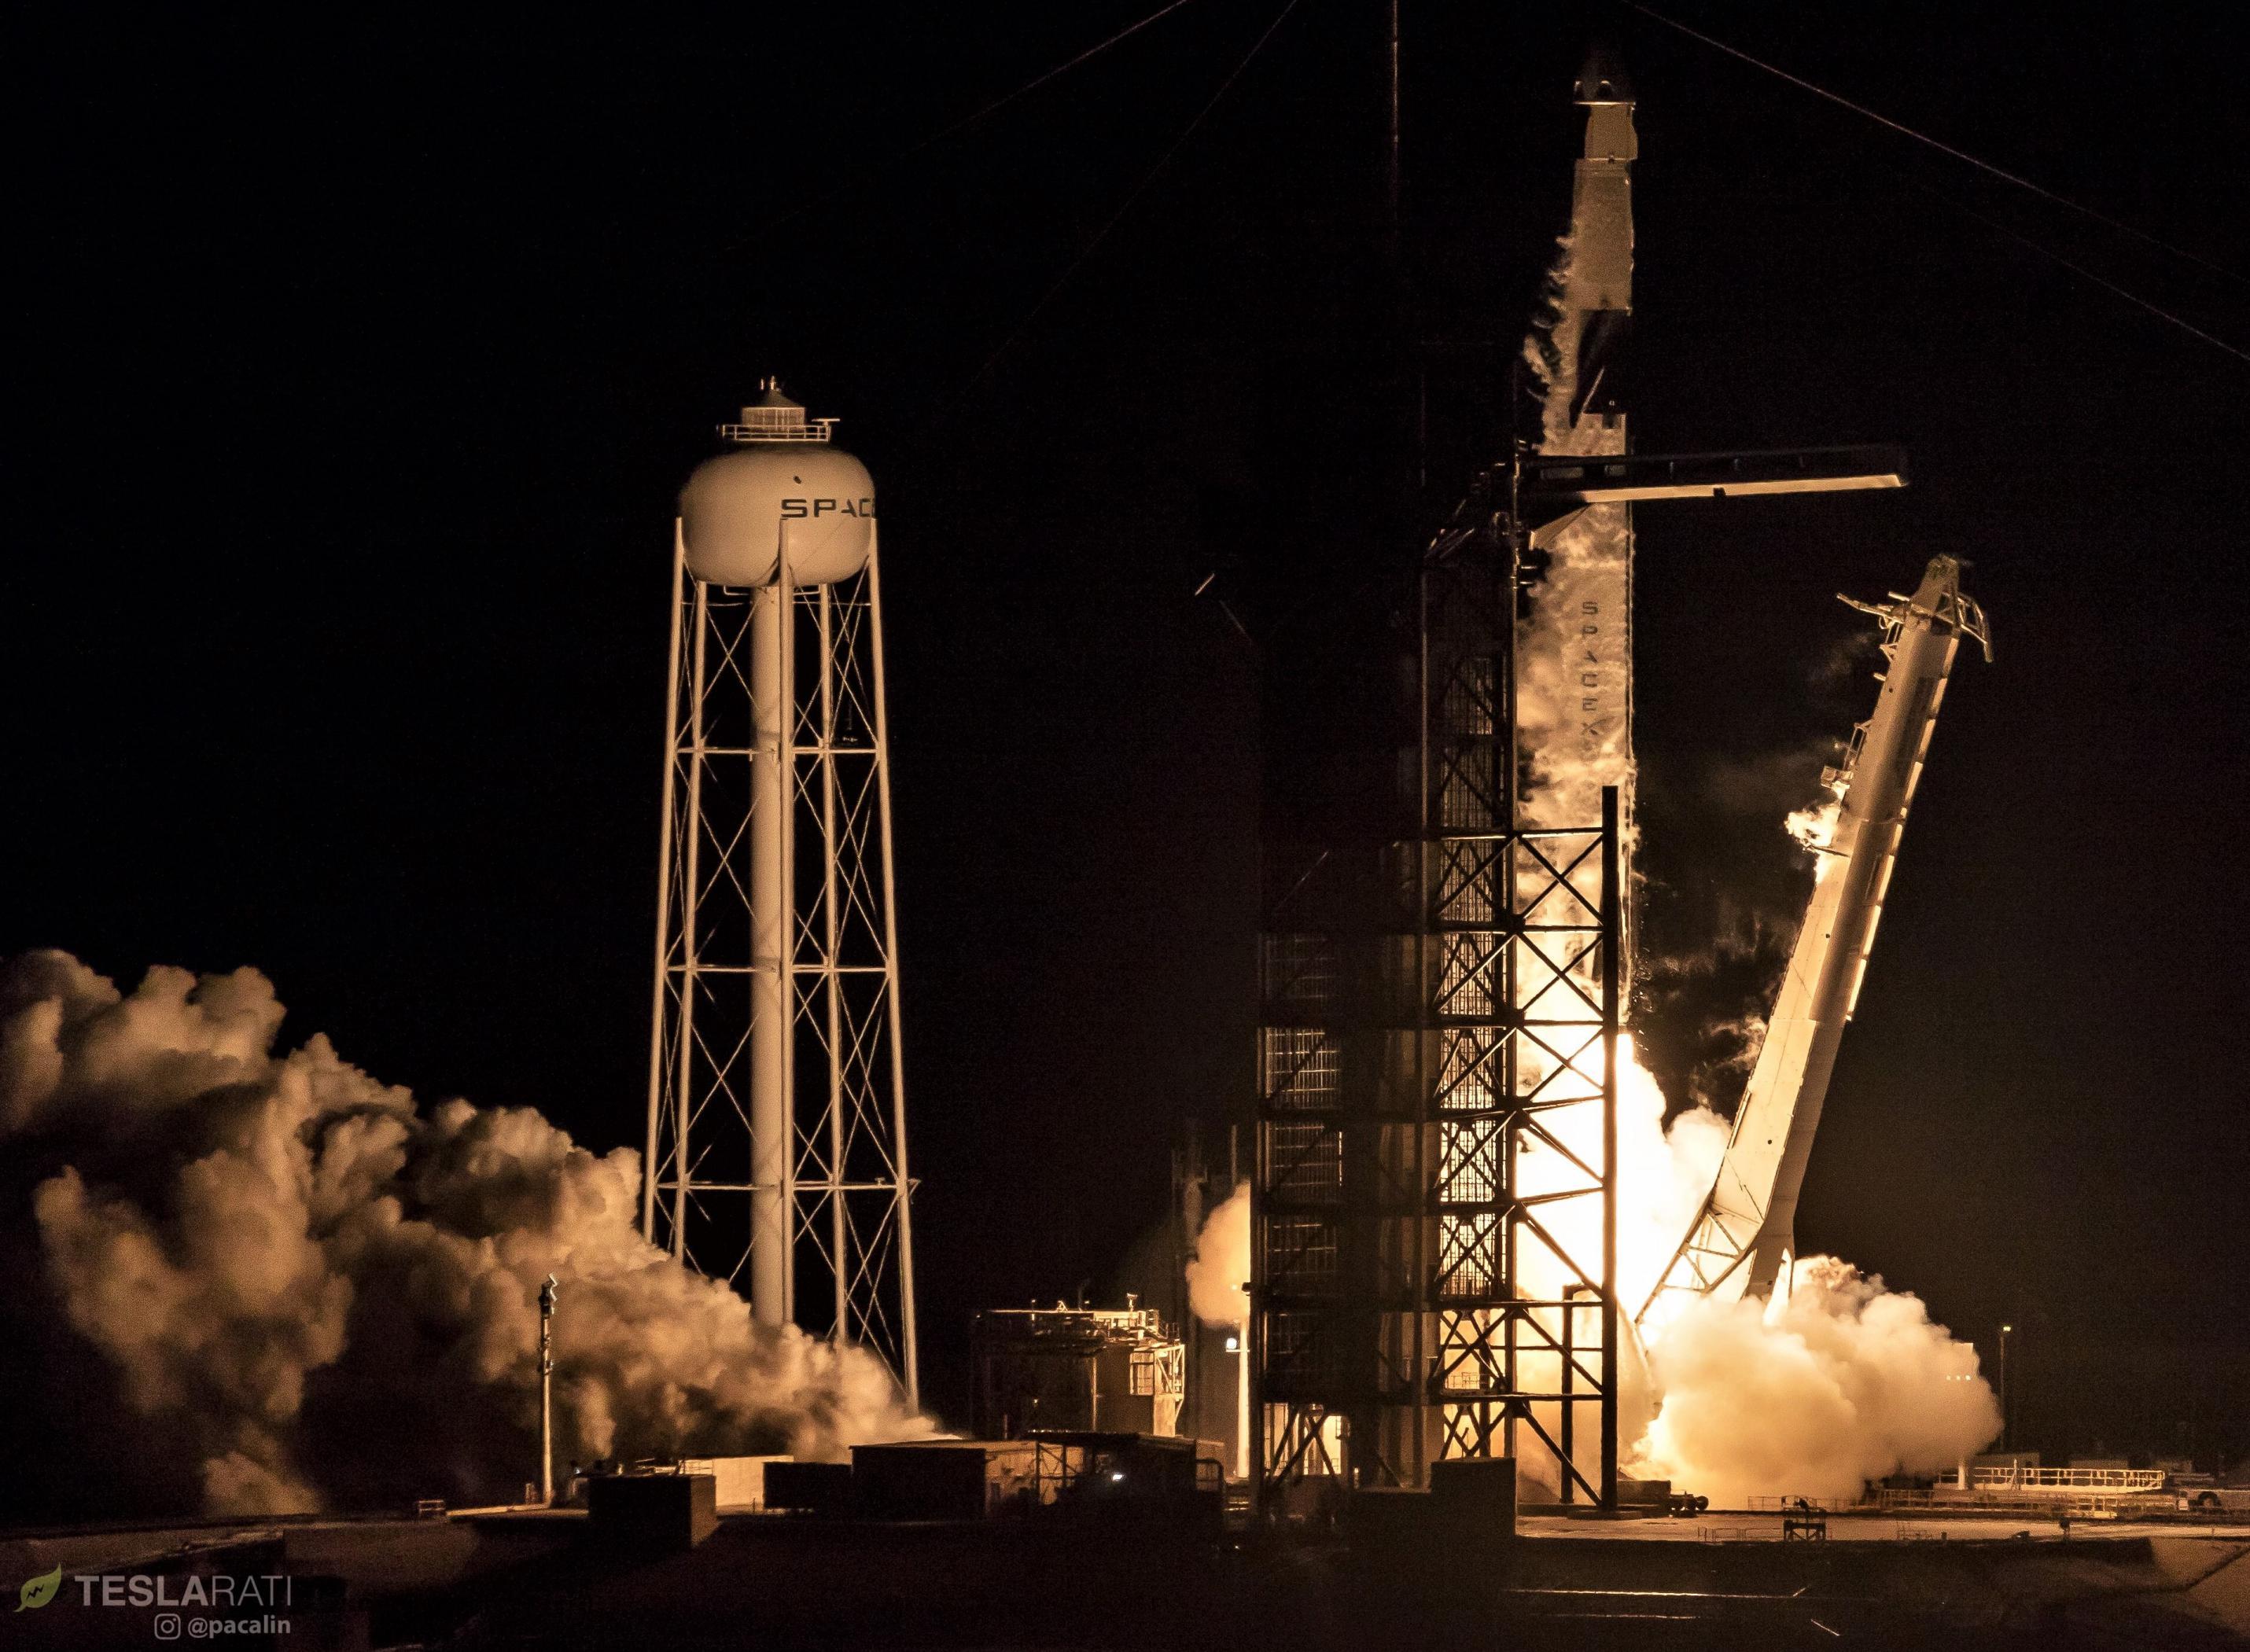 Crew Dragon Falcon 9 B1051 DM-1 liftoff 030219 (Pauline Acalin) 1 edit (c)